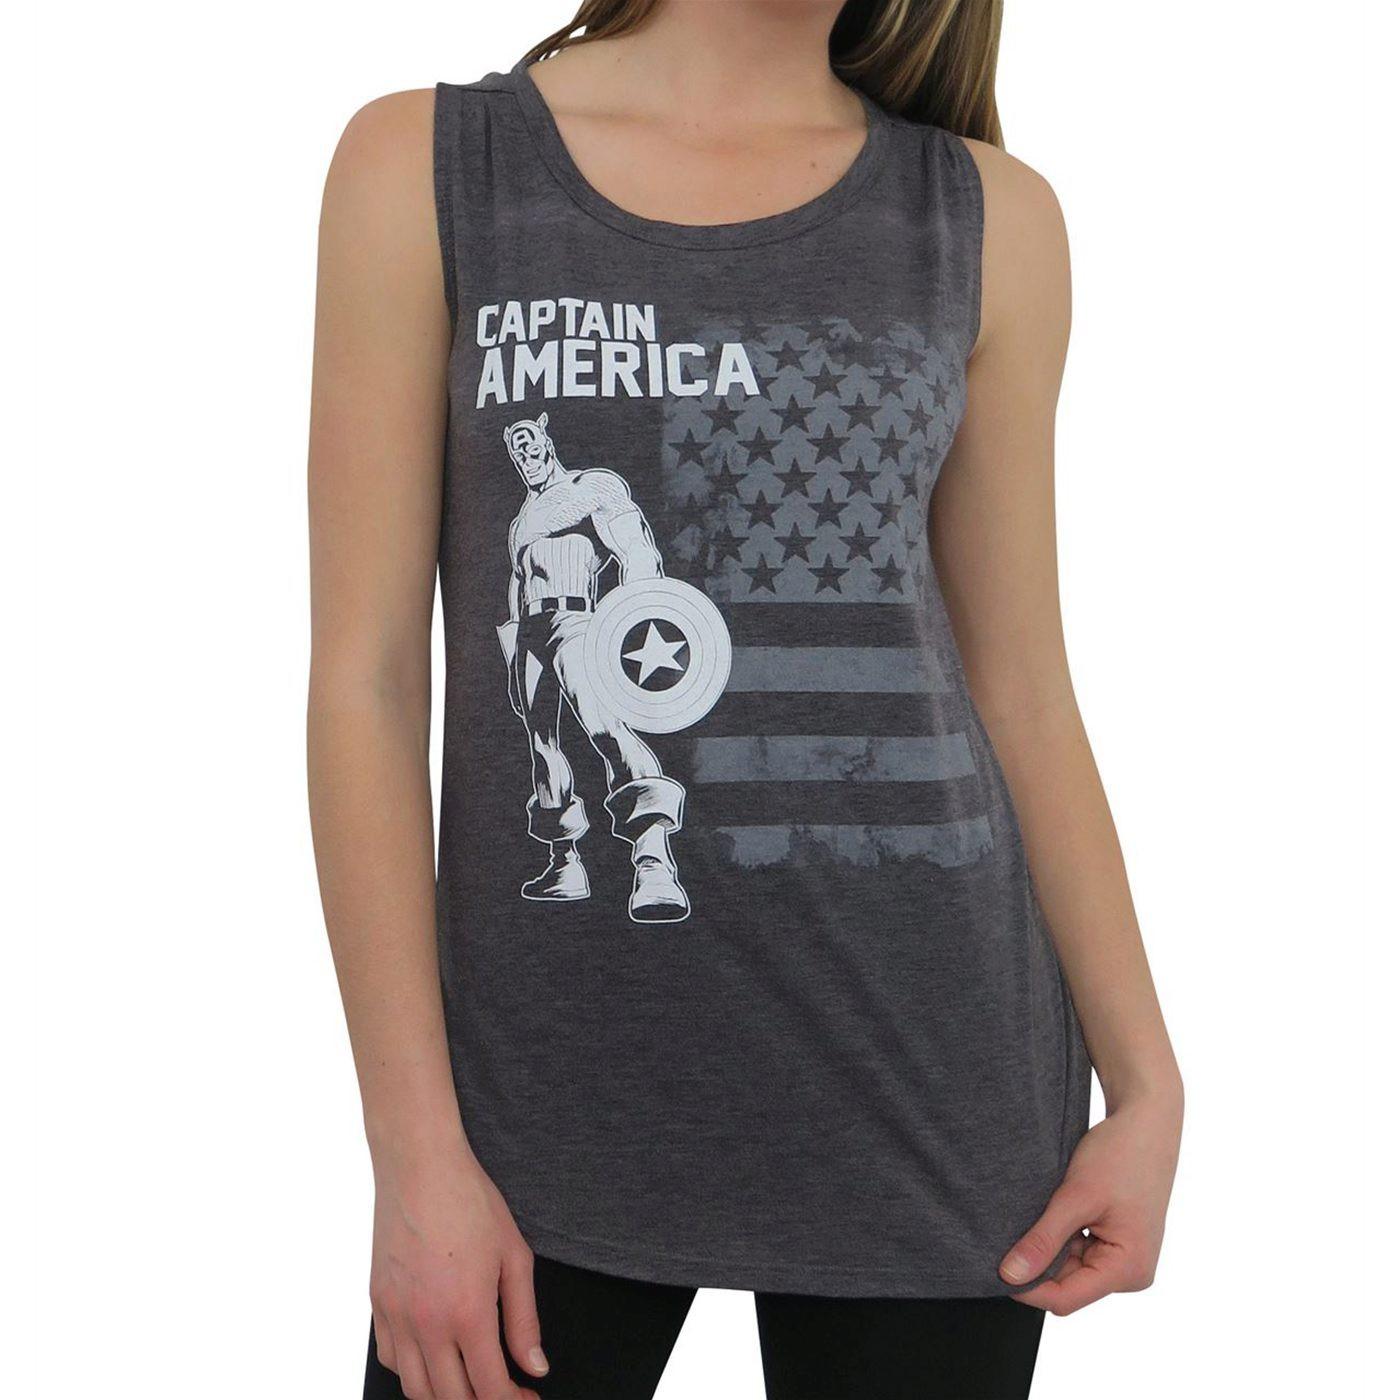 Captain America Old Glory Women's Tank Top